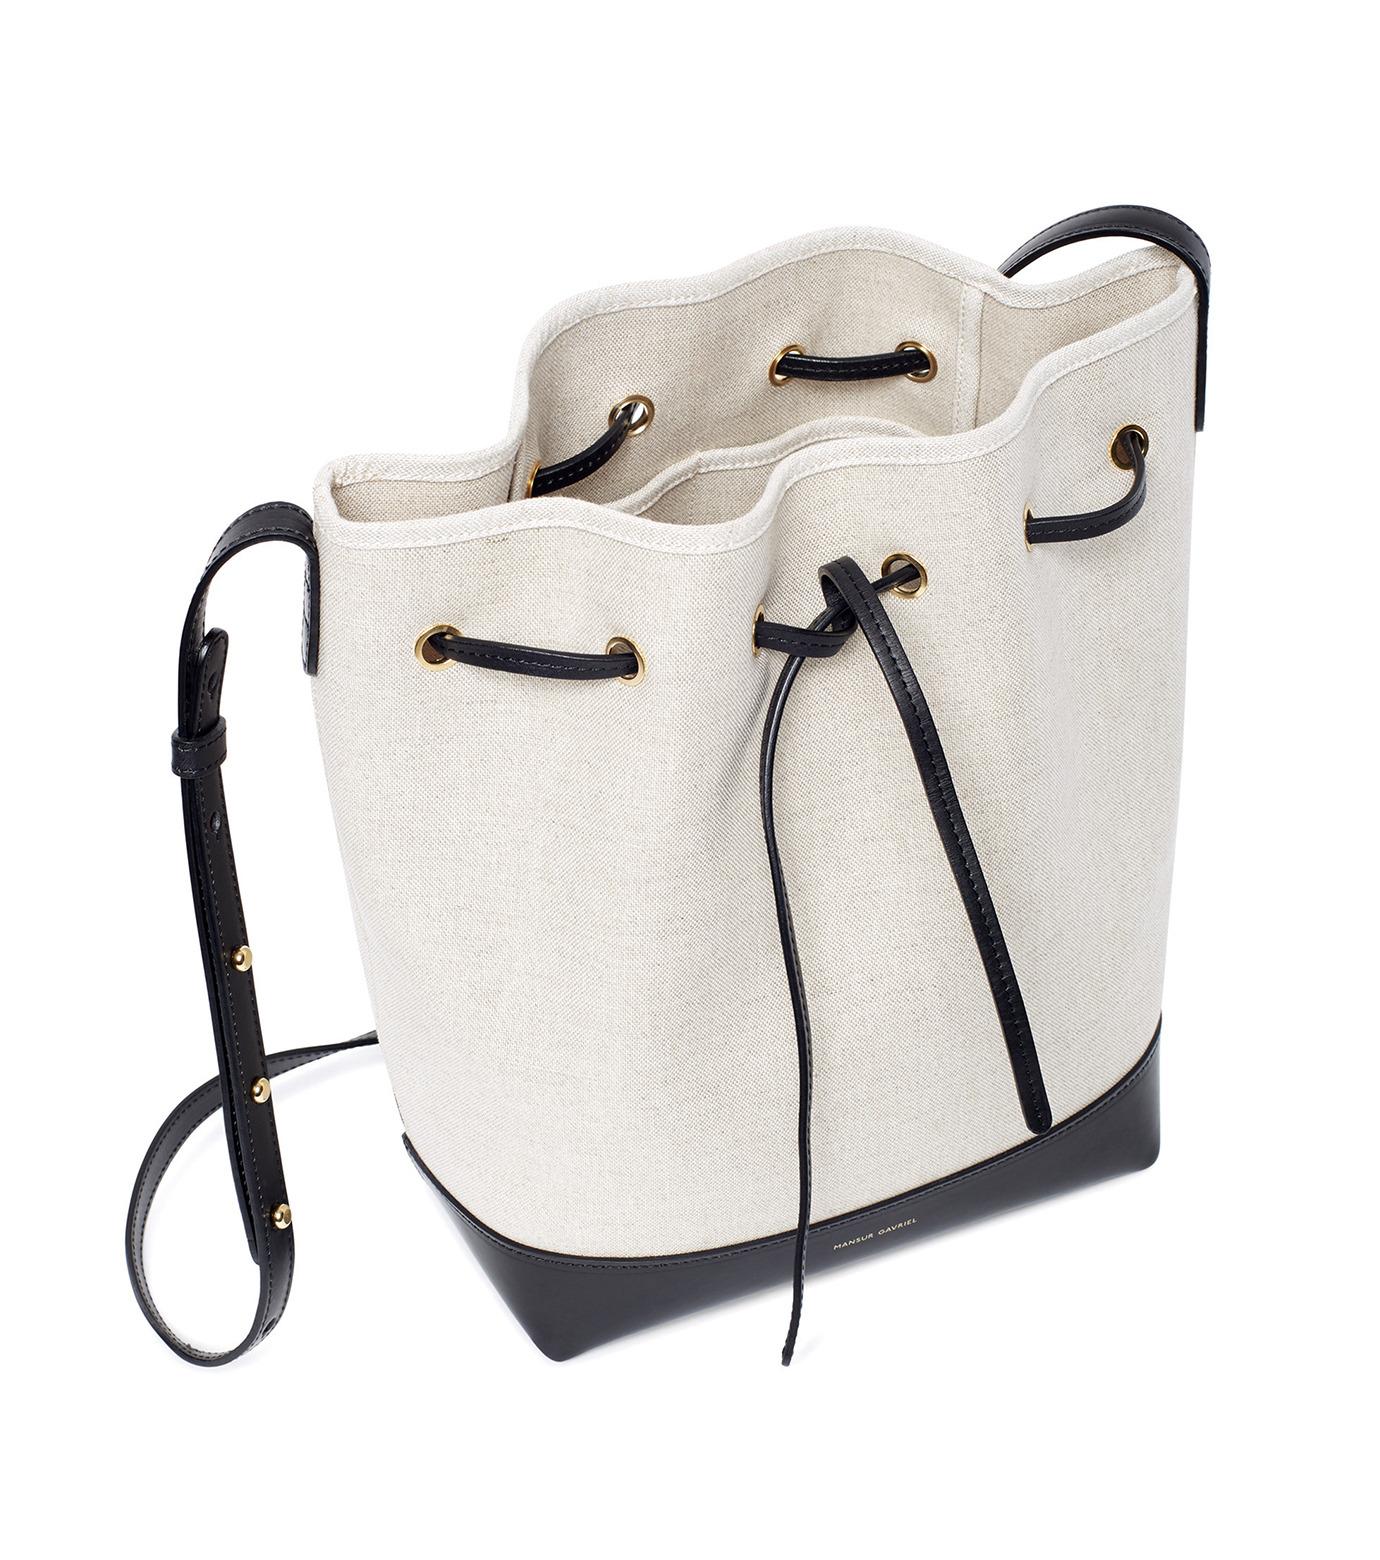 Mansur Gavriel(マンサーガブリエル)のCanvas Bucket Bag-WHITE(バッグ/bag)-HBB003CN-5 拡大詳細画像3